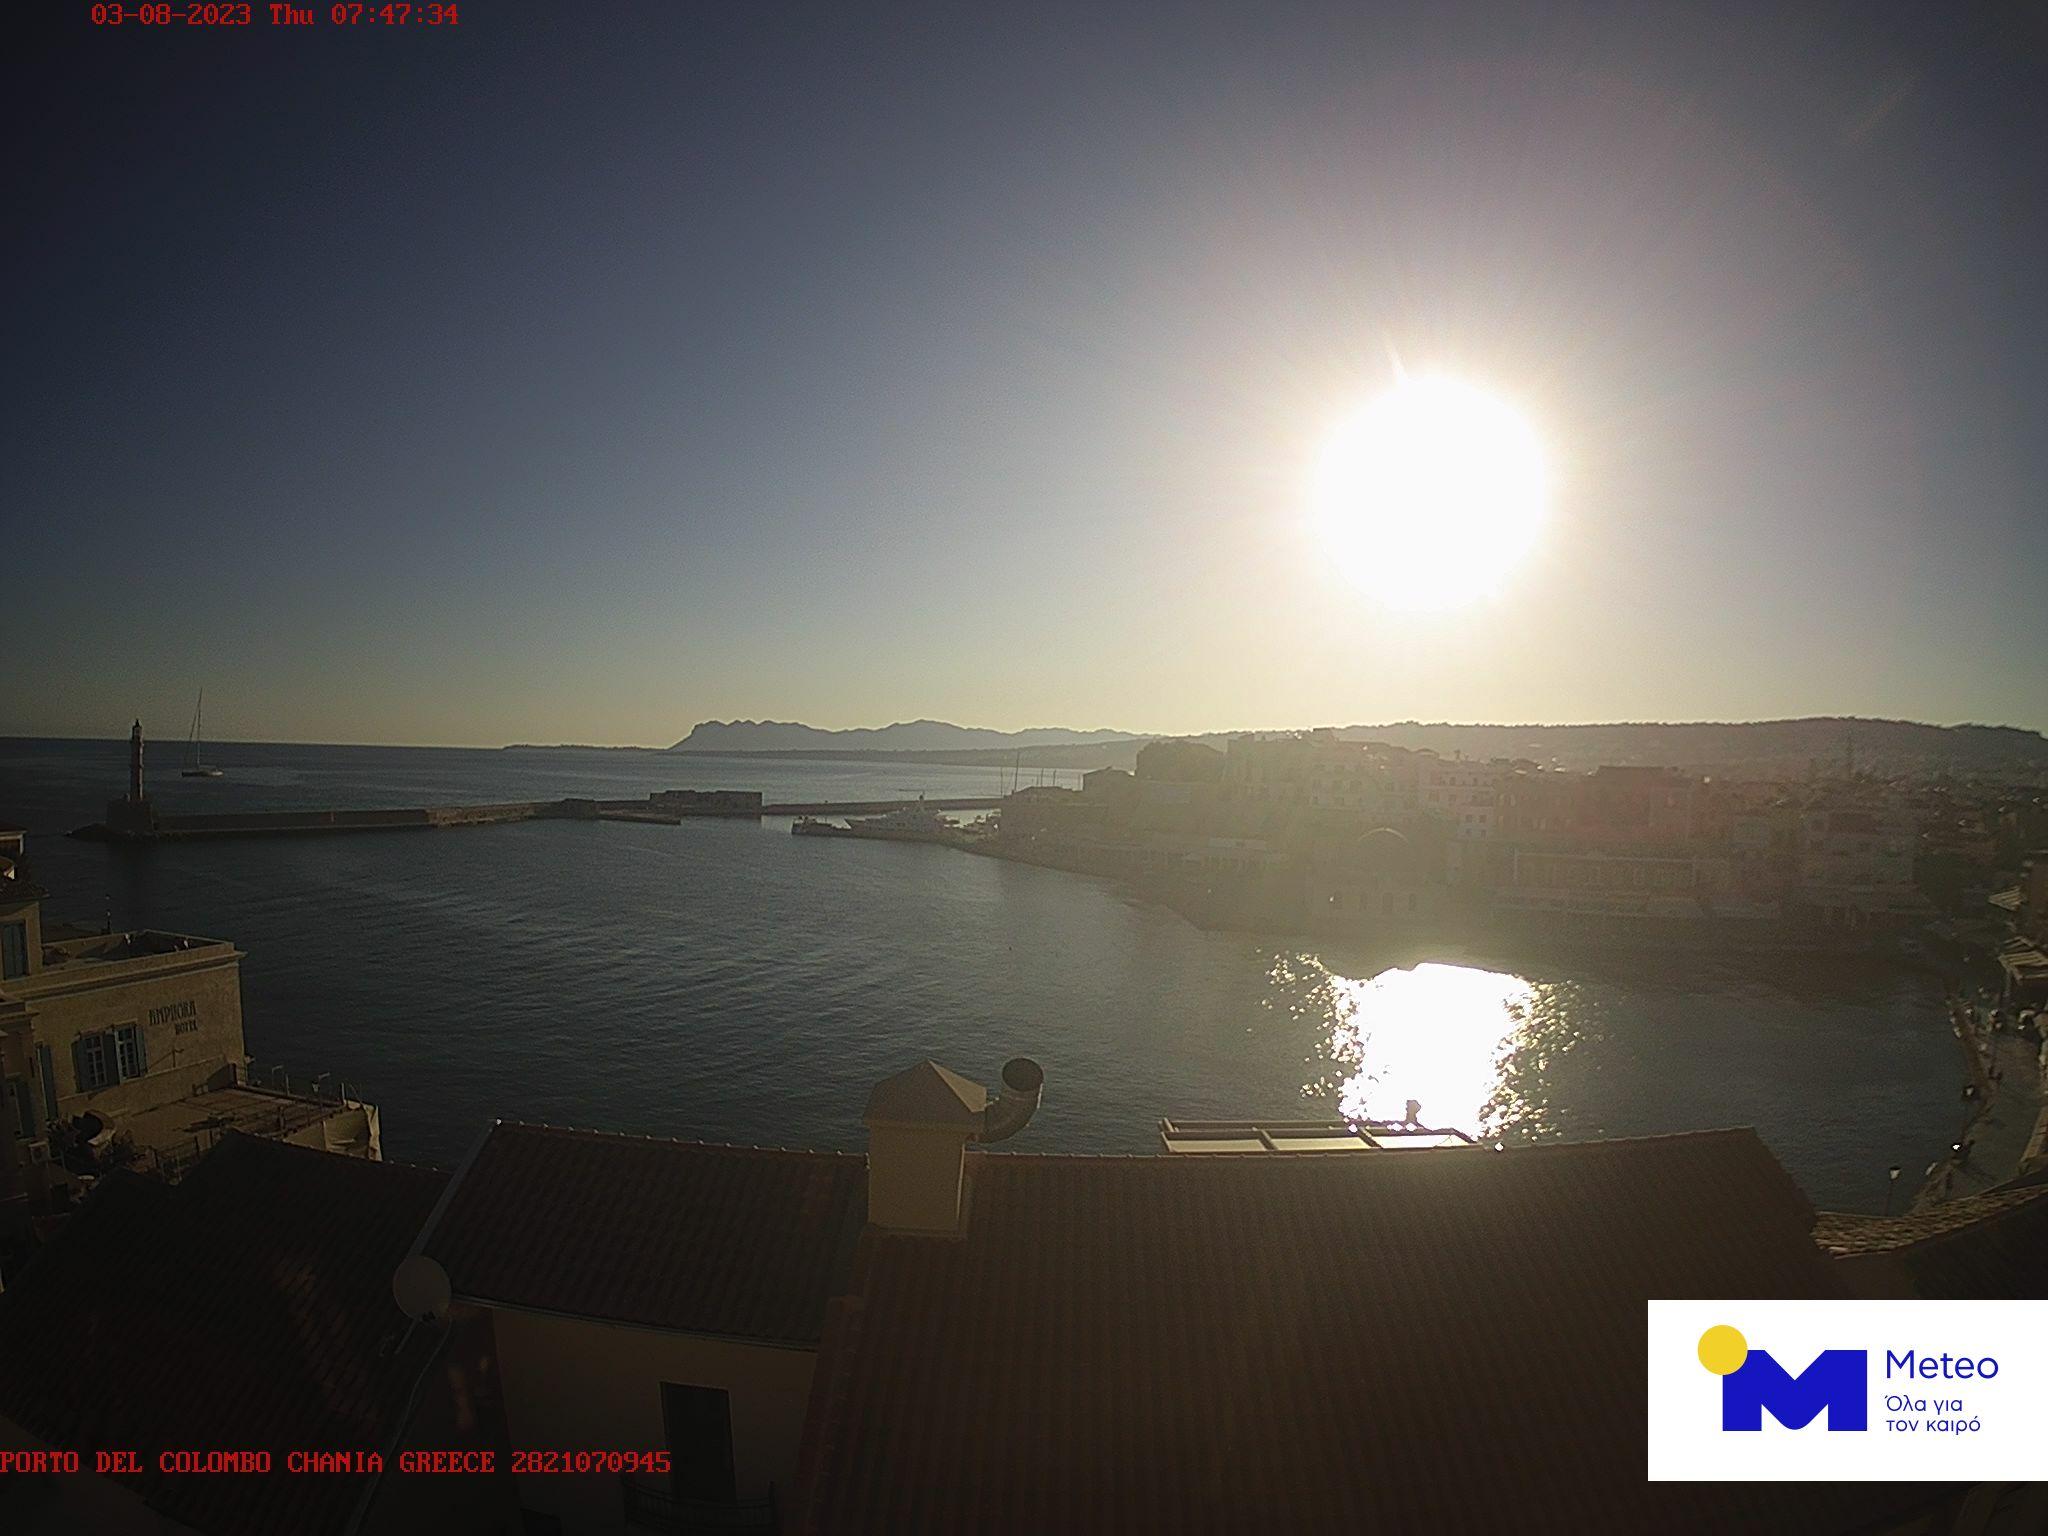 Онлайн веб камера Греции, Крит, Ханья, венецианская гавань